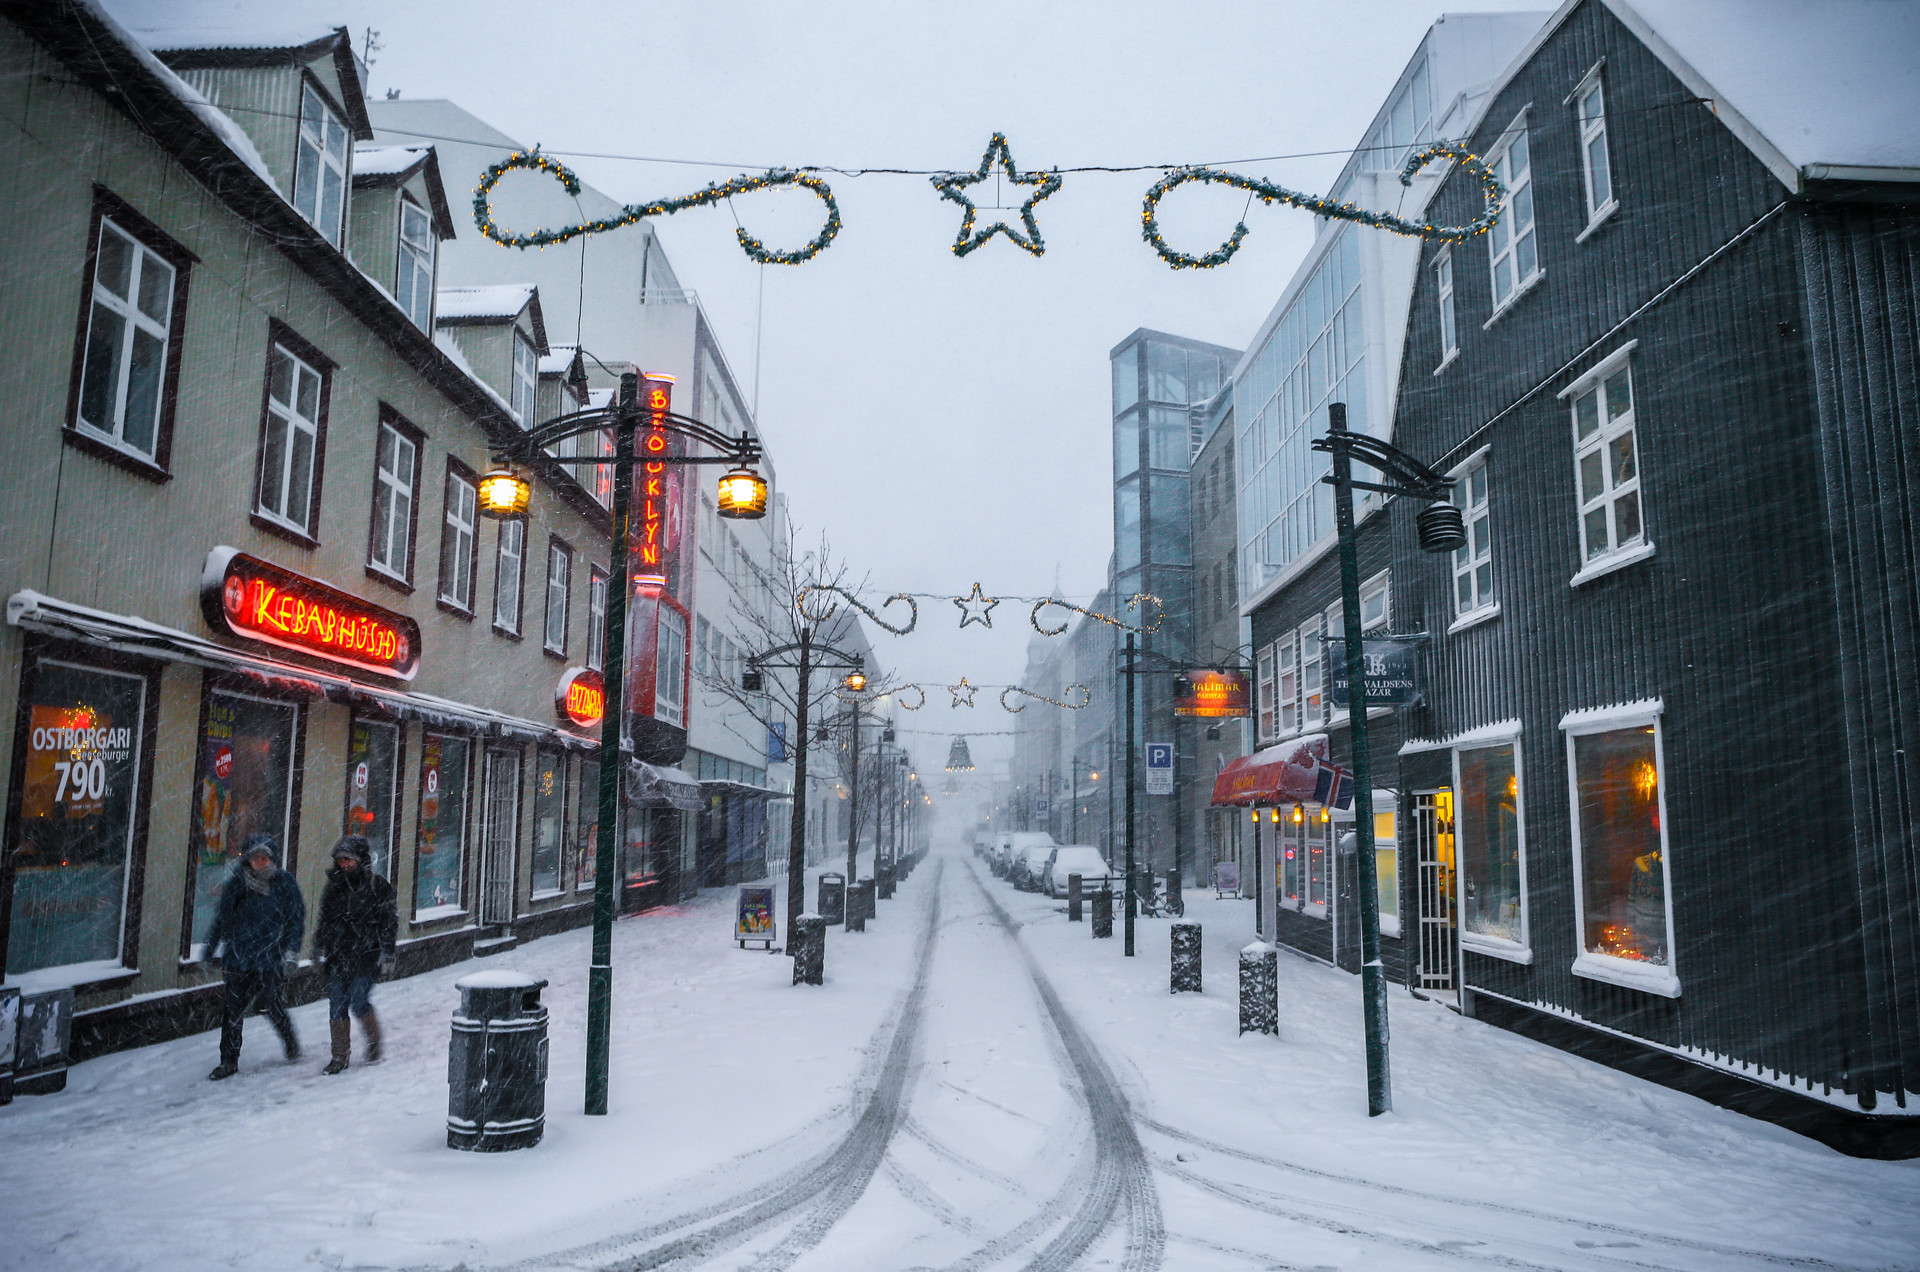 Ricmond Iceland Reykjavik Sex In Shops